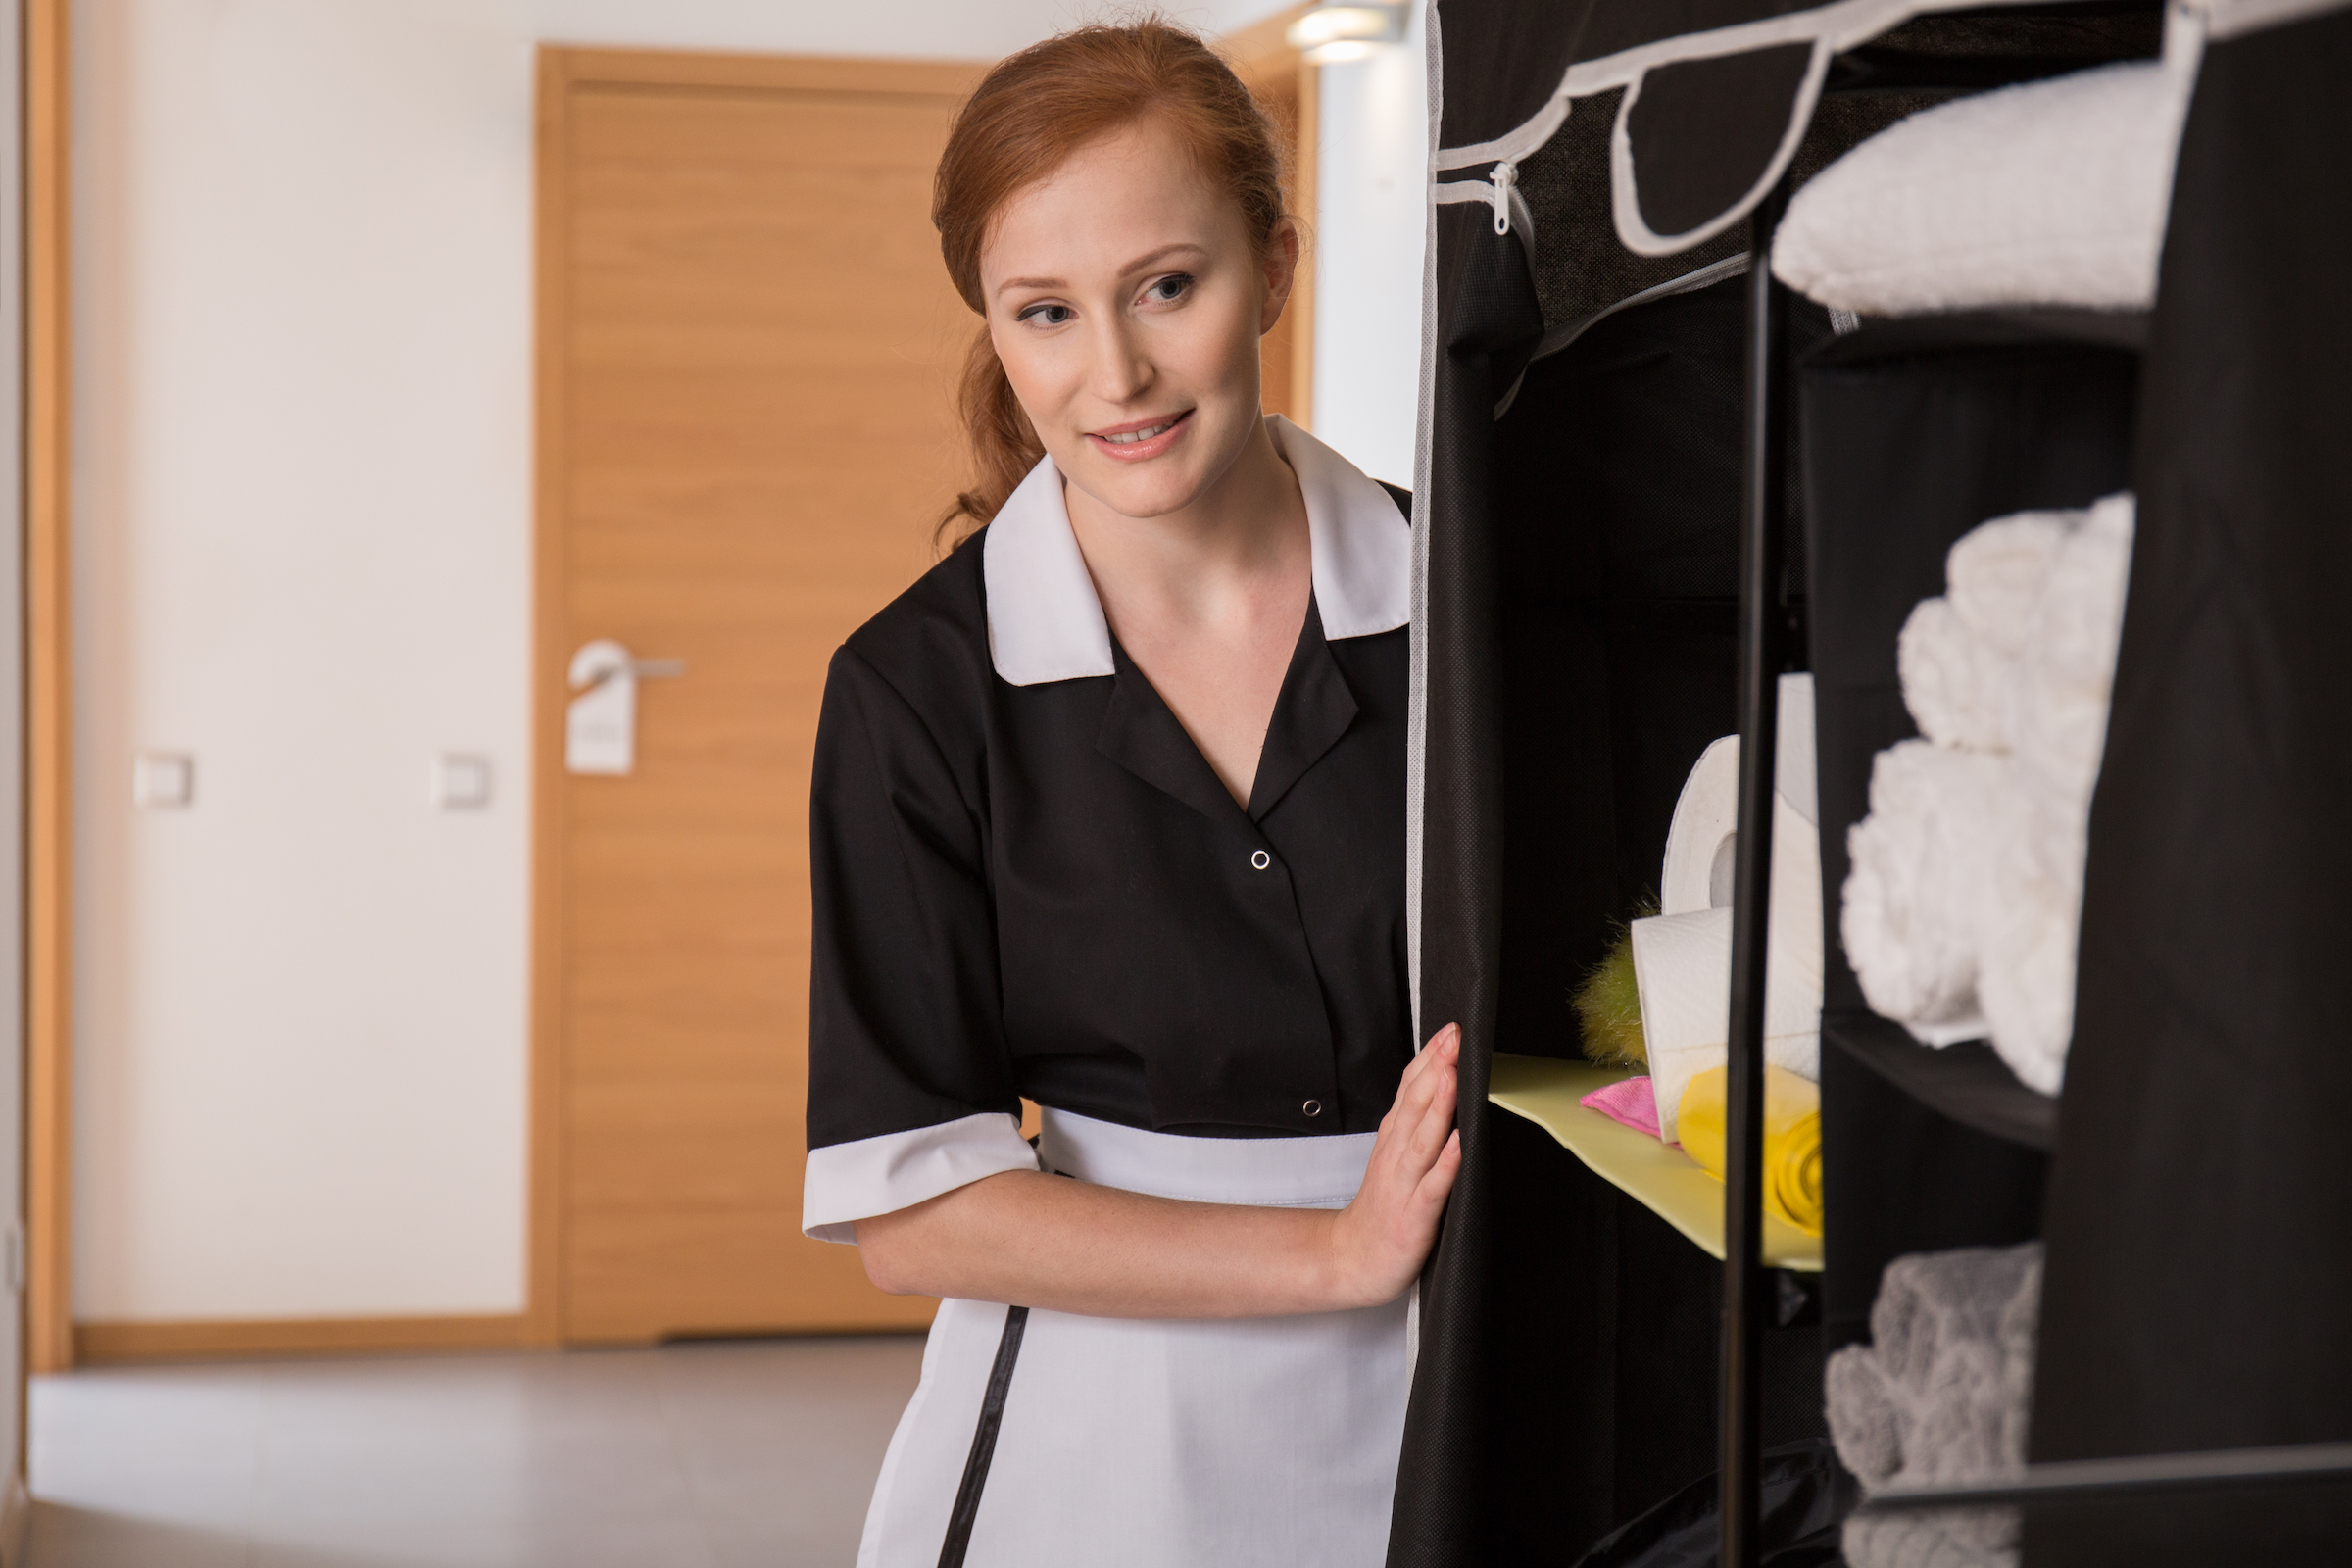 maid in uniform in corridor PUCBVDX